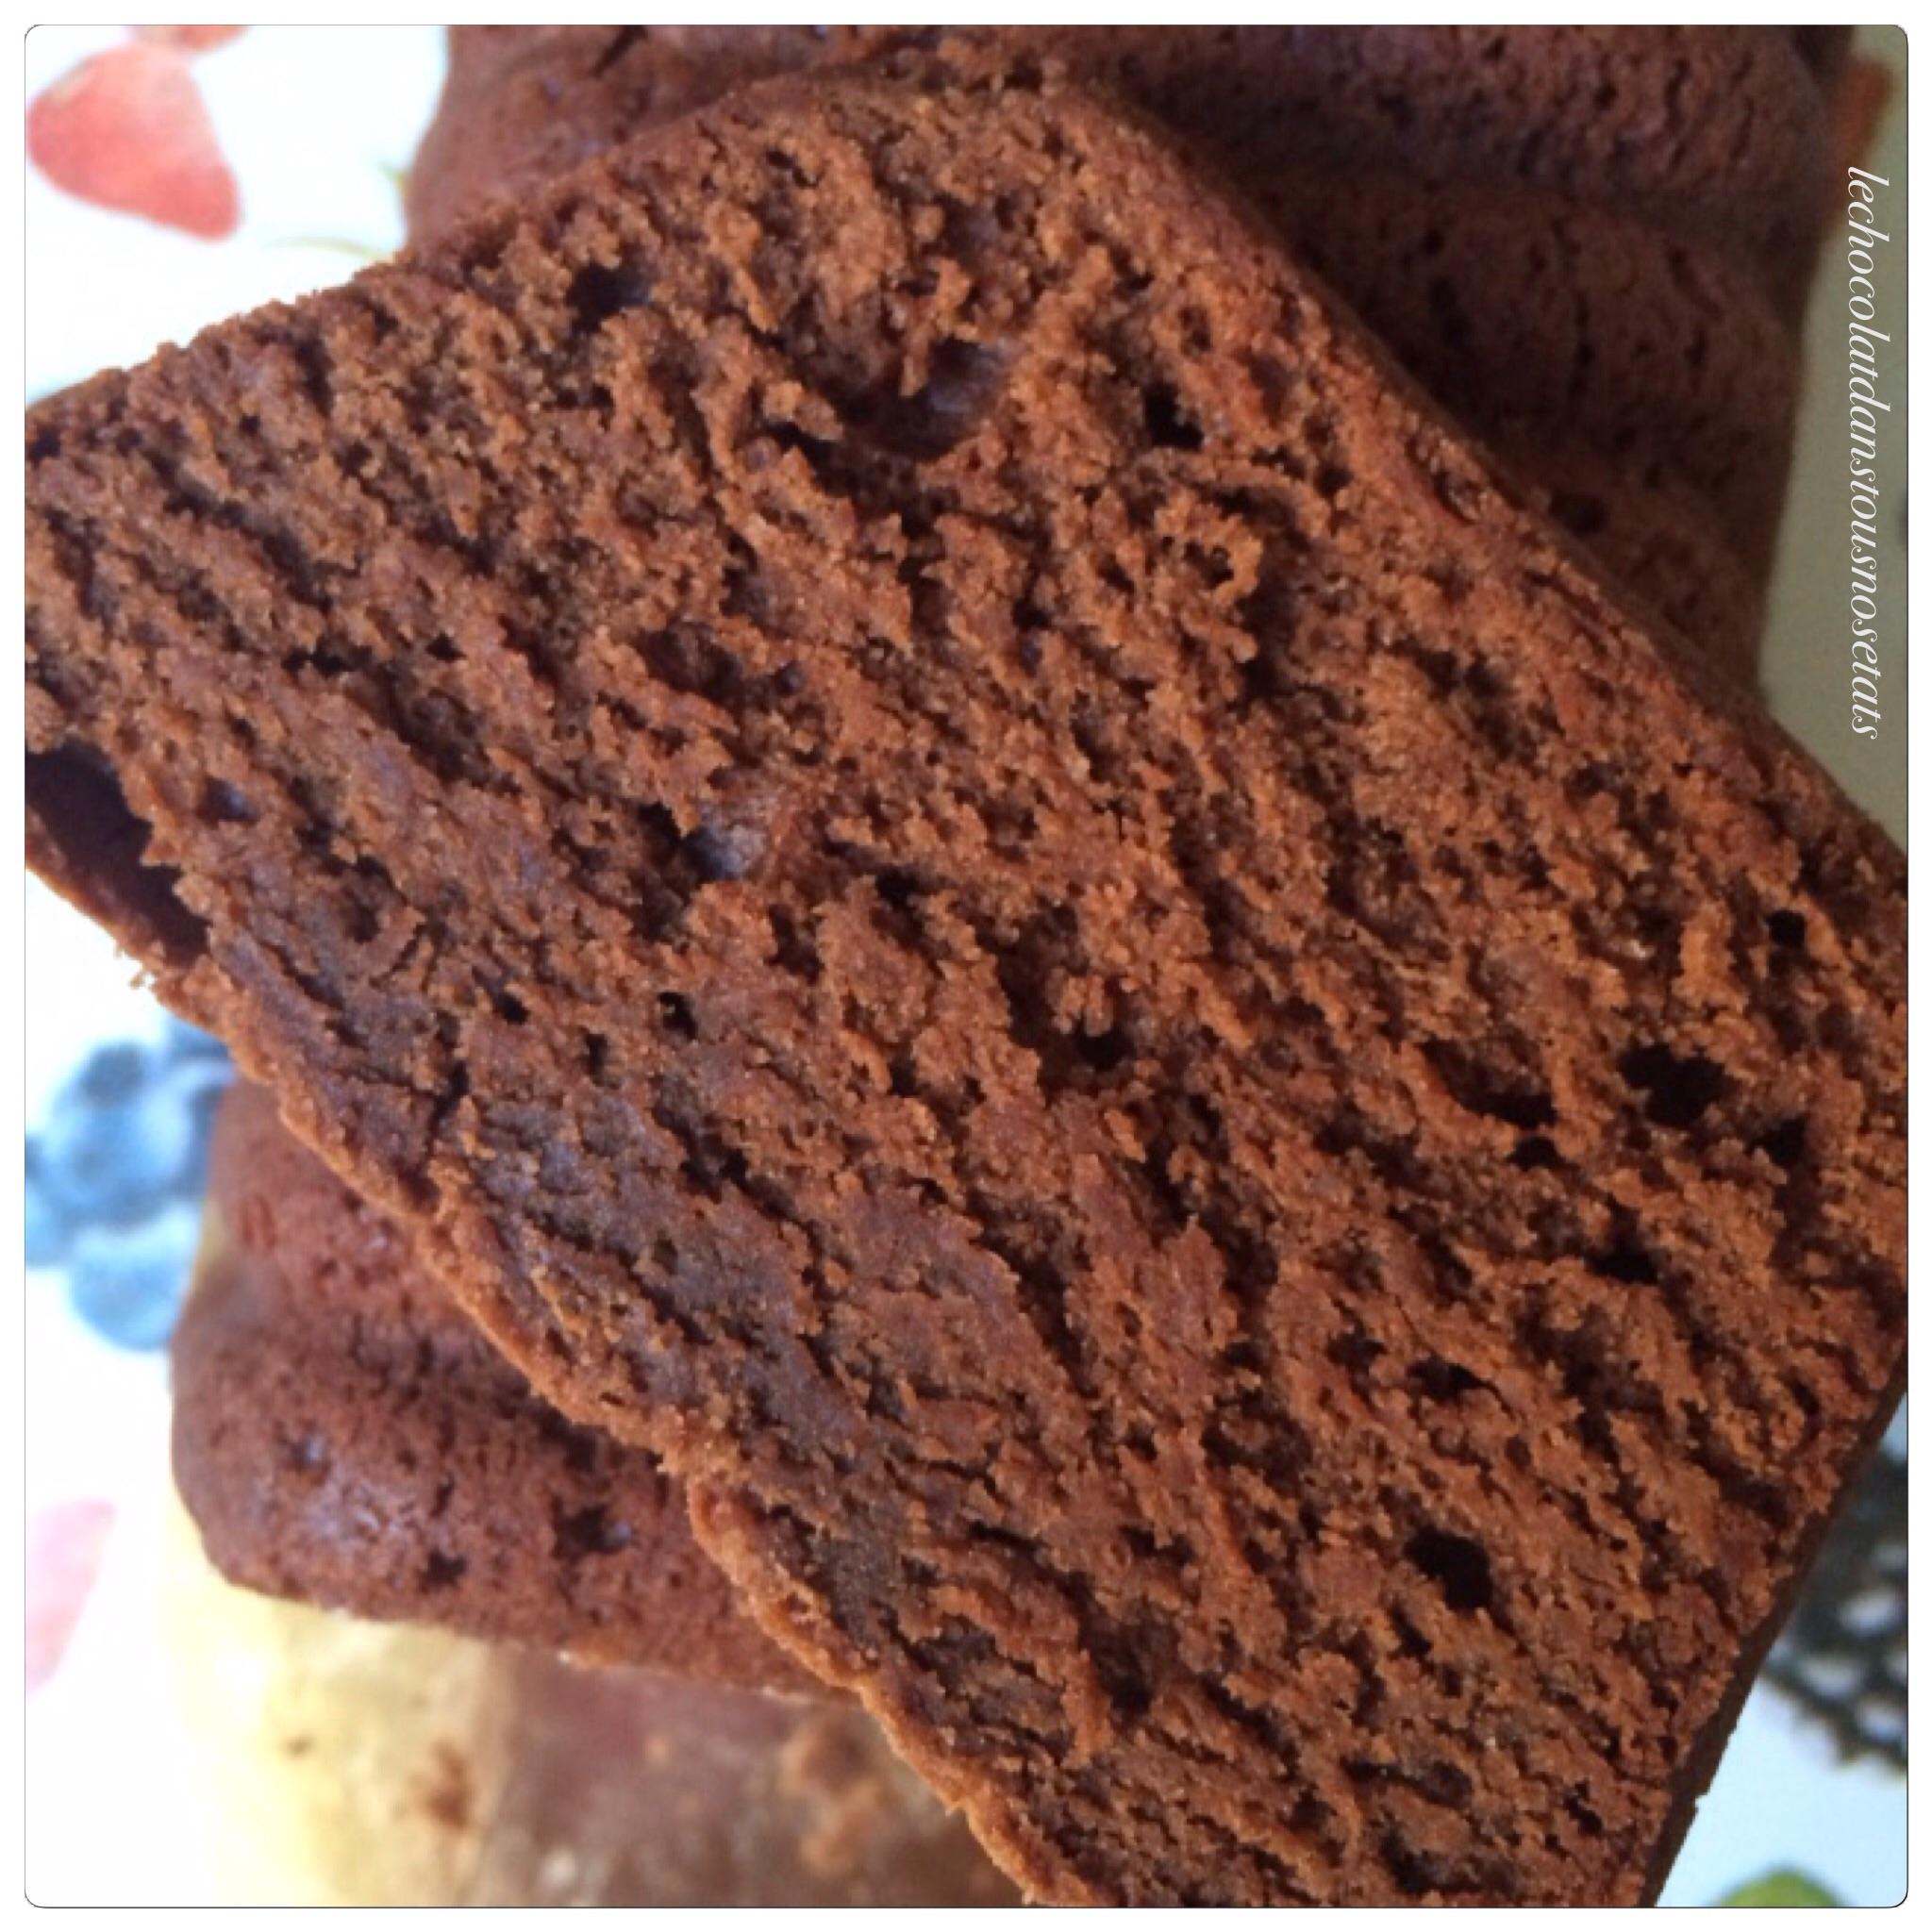 Pleyel La Maison du Chocolat